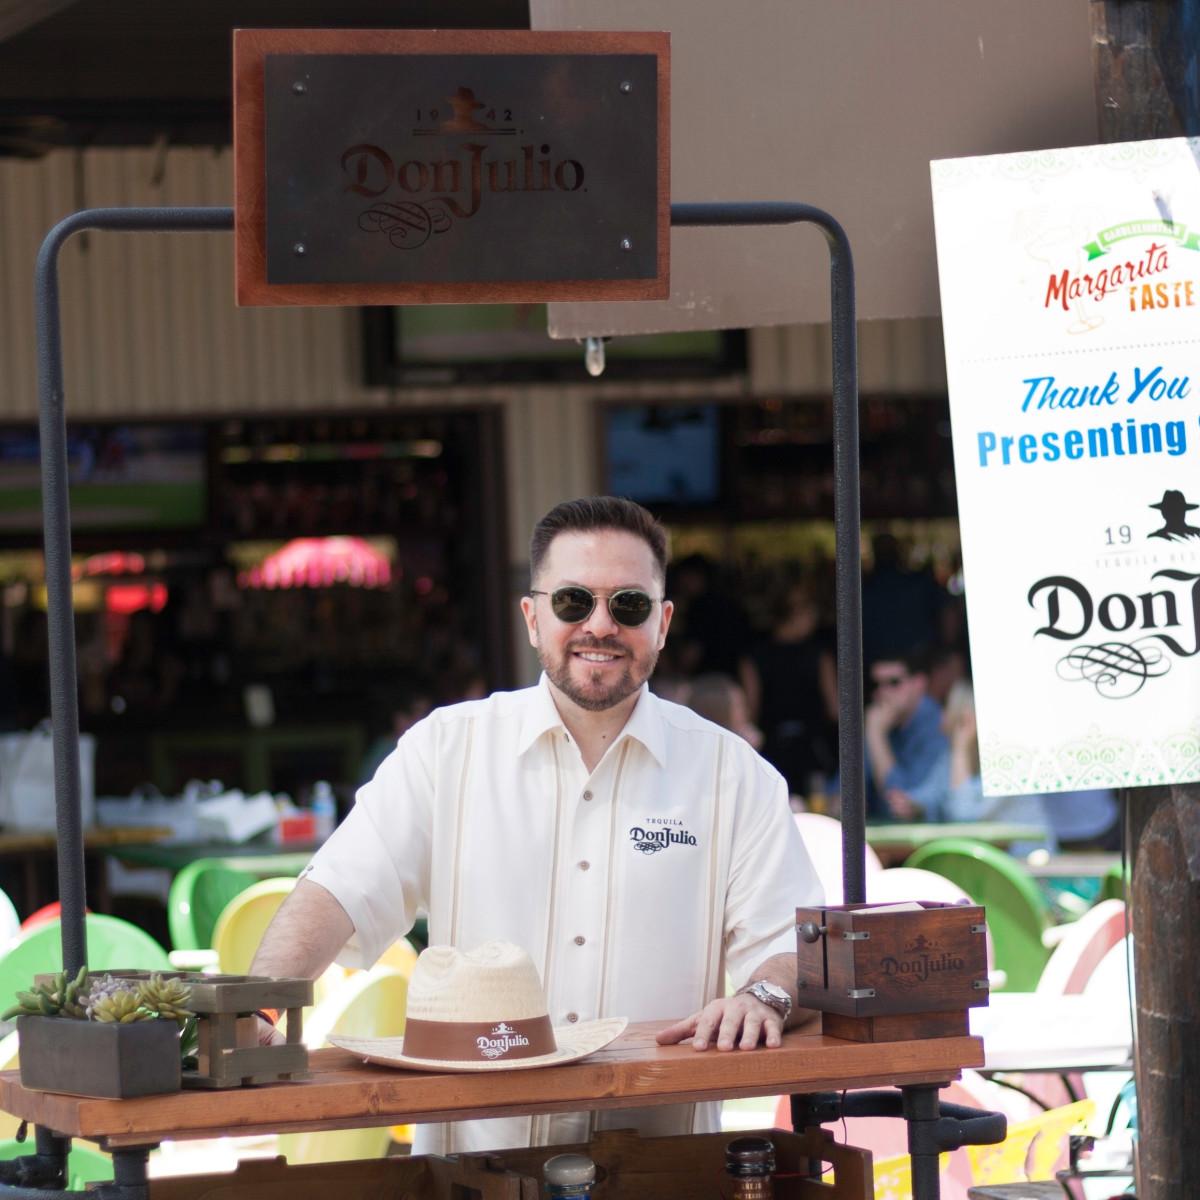 Jorge Raptis, Don Julio Presenting Sponsor at Margarita Taste-off